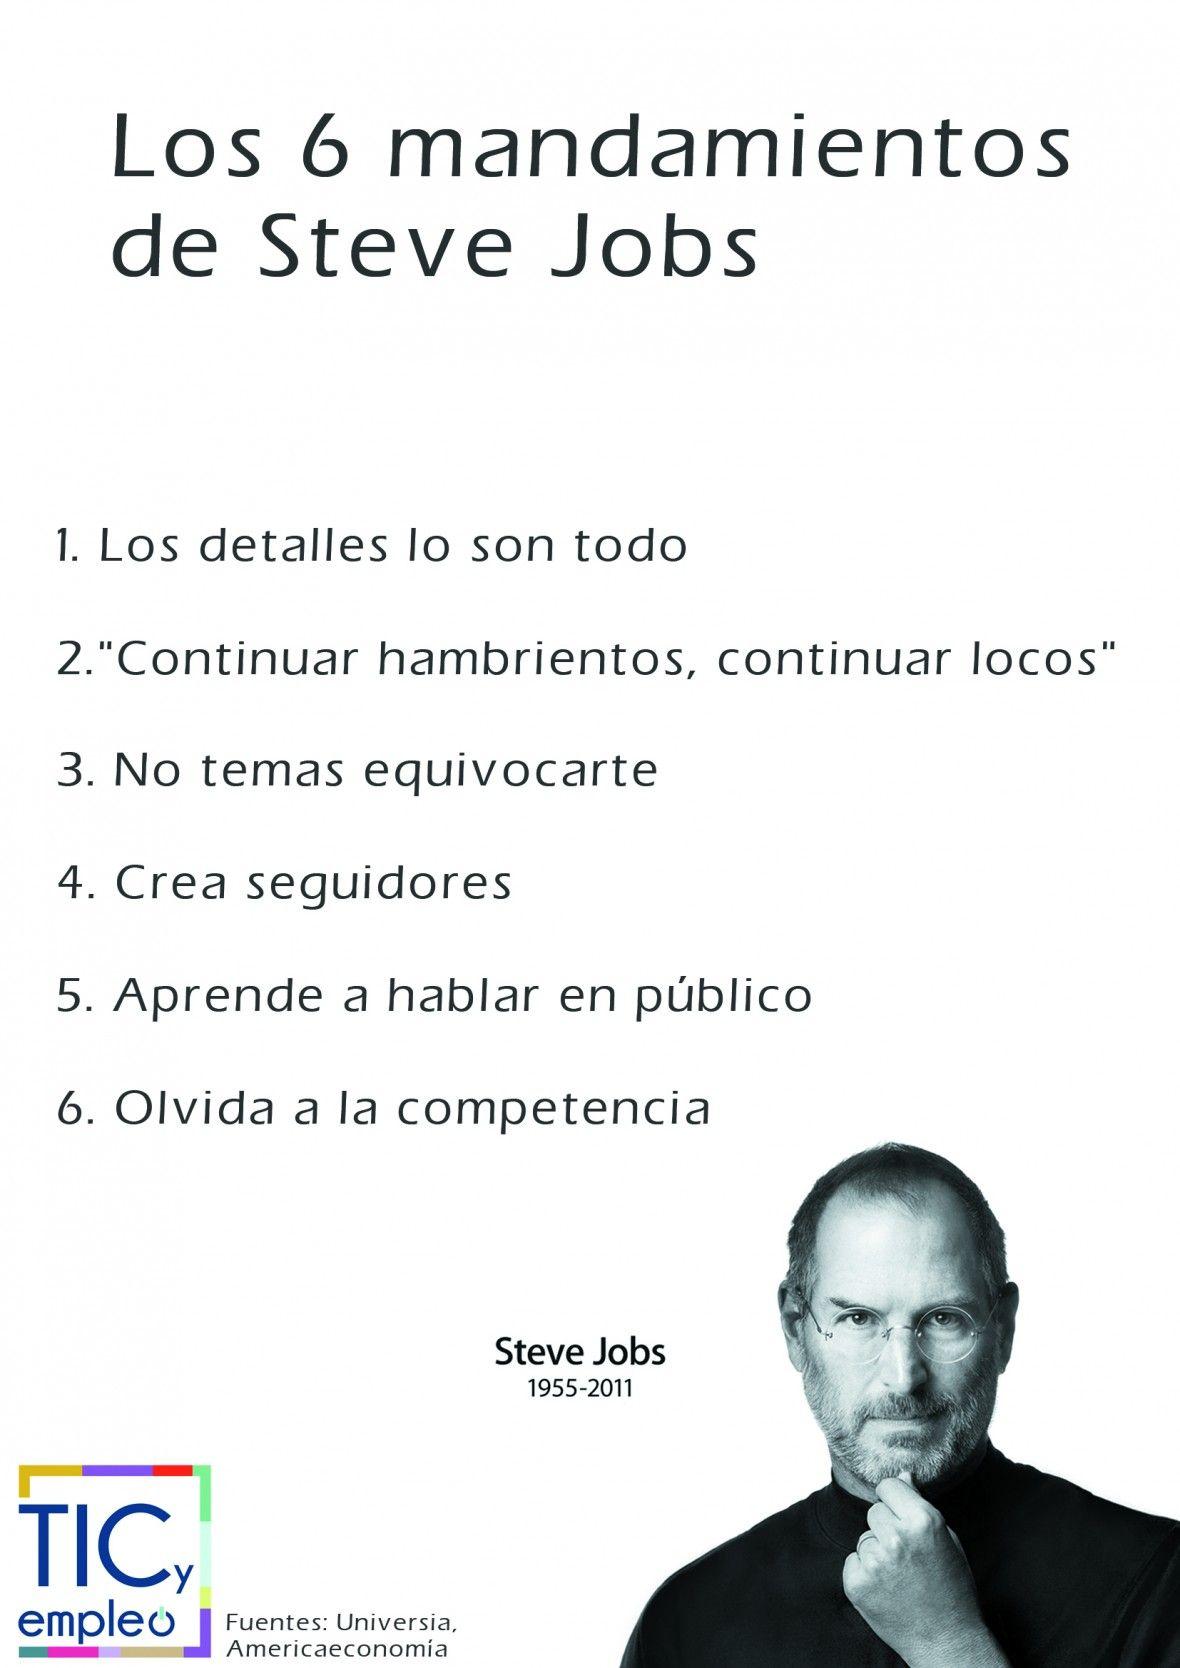 Los 6 Mandamientos De Steve Jobs Infografia Infographic Citas